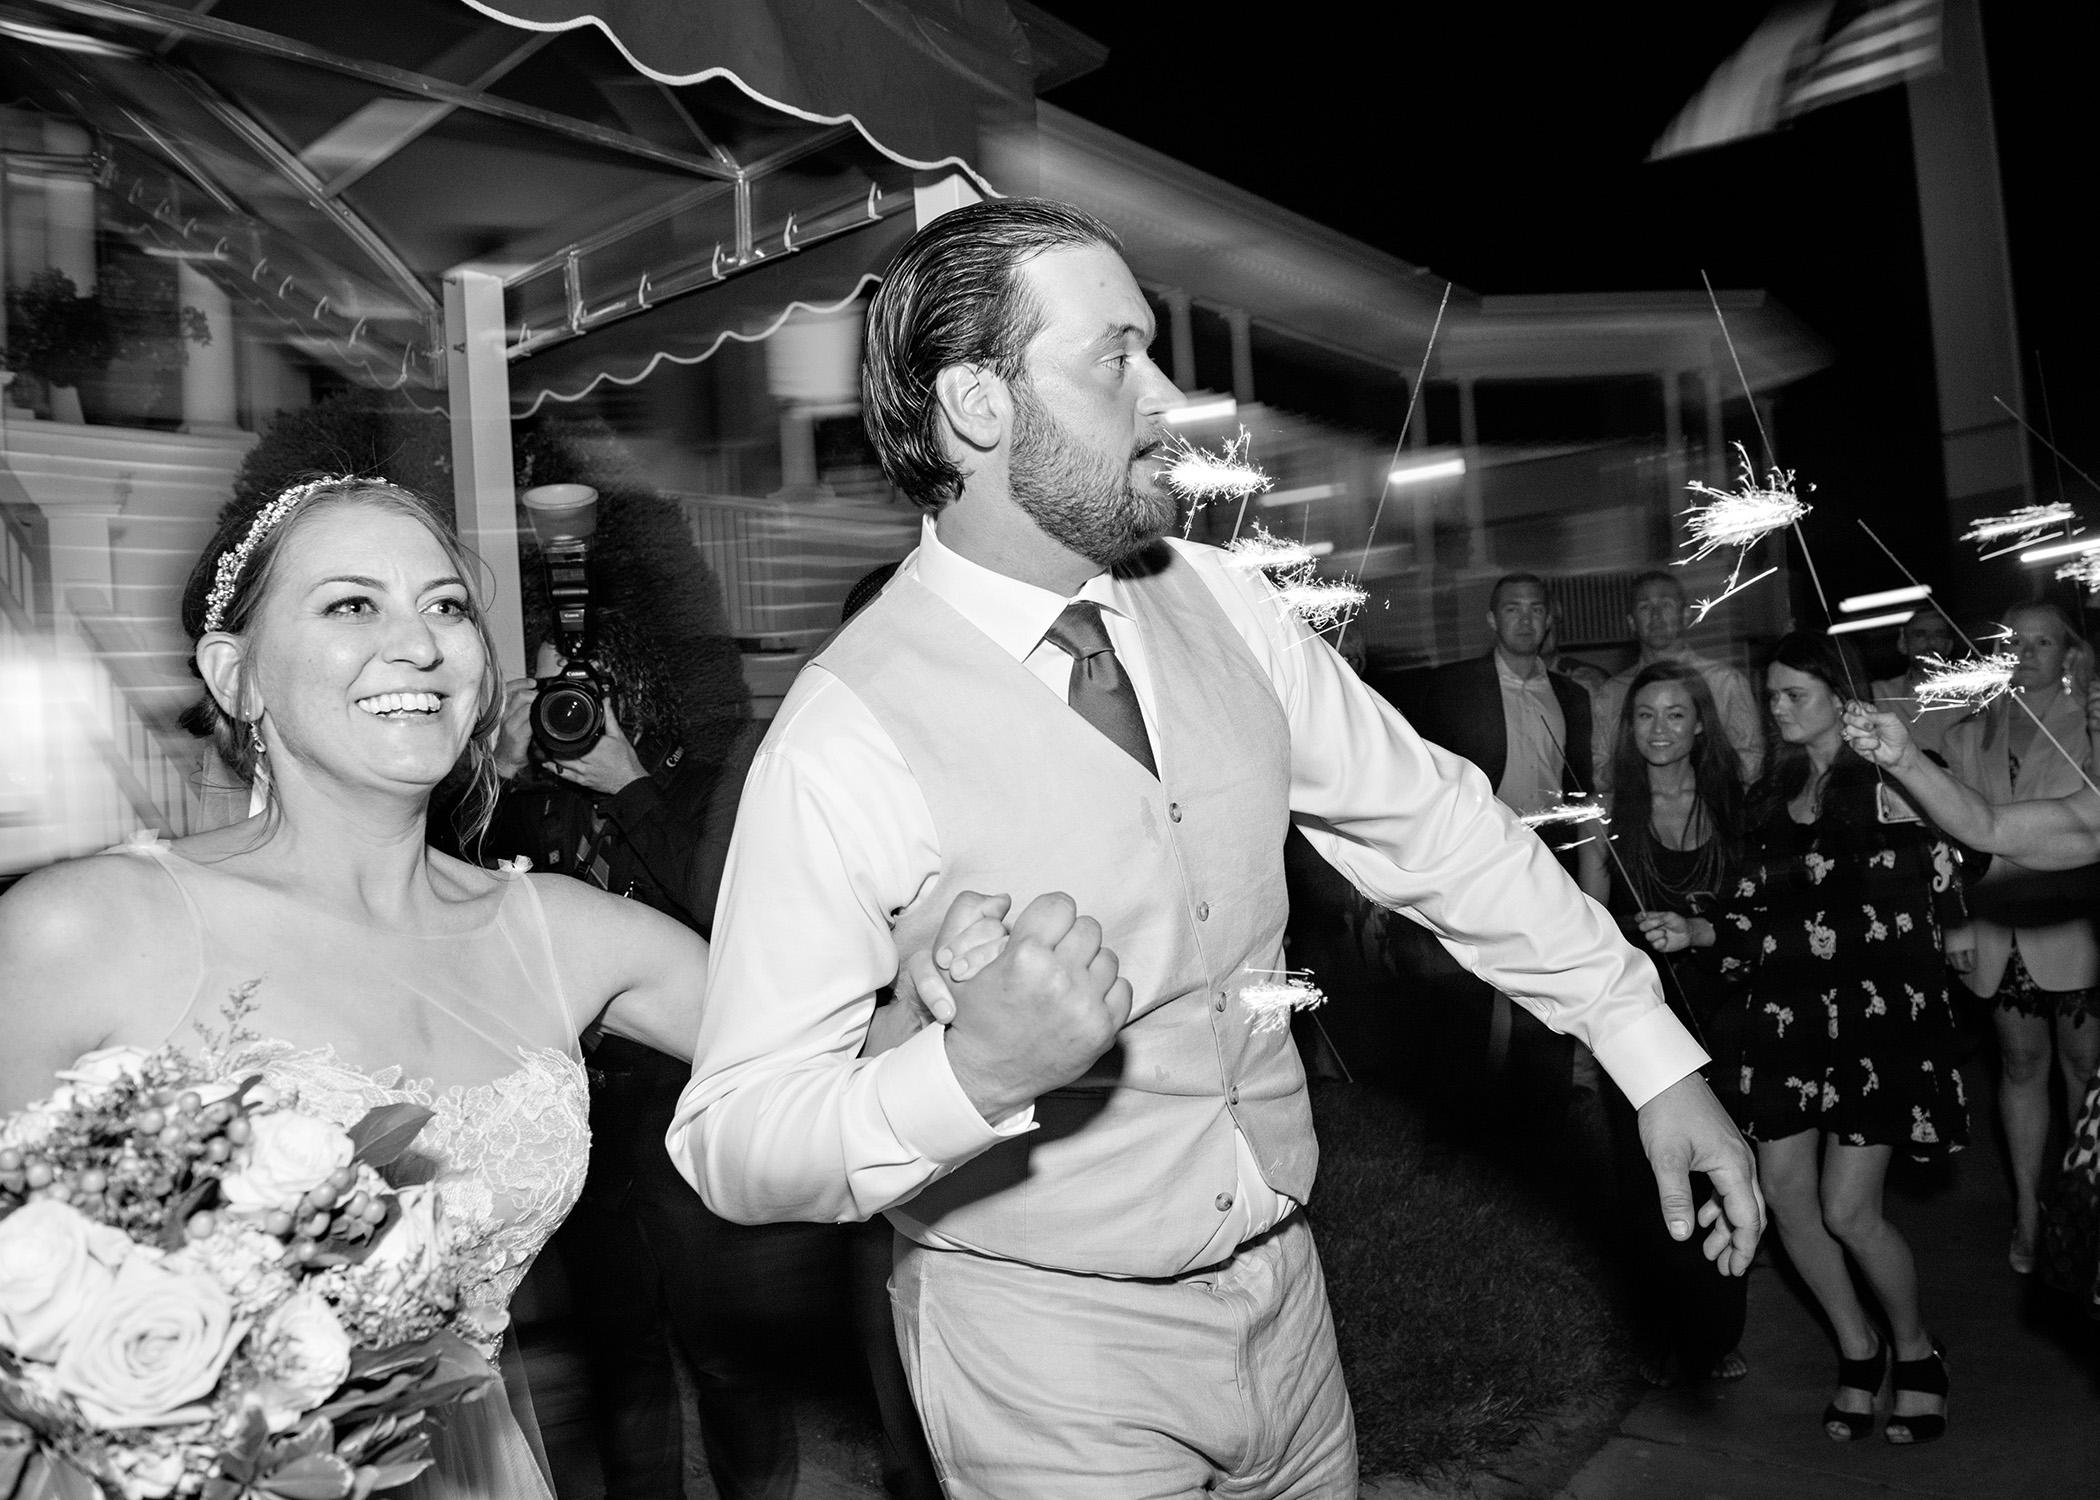 57-Sara Stadtmiller-SRS-Photography-Asbury-Park-Wedding-Photographer-Monmouth-County-Wedding-Photographer-NJ-Wedding-Photographer-Avon-by-the-Sea-Wedding-The-Columns-Wedding-sparkler-exit